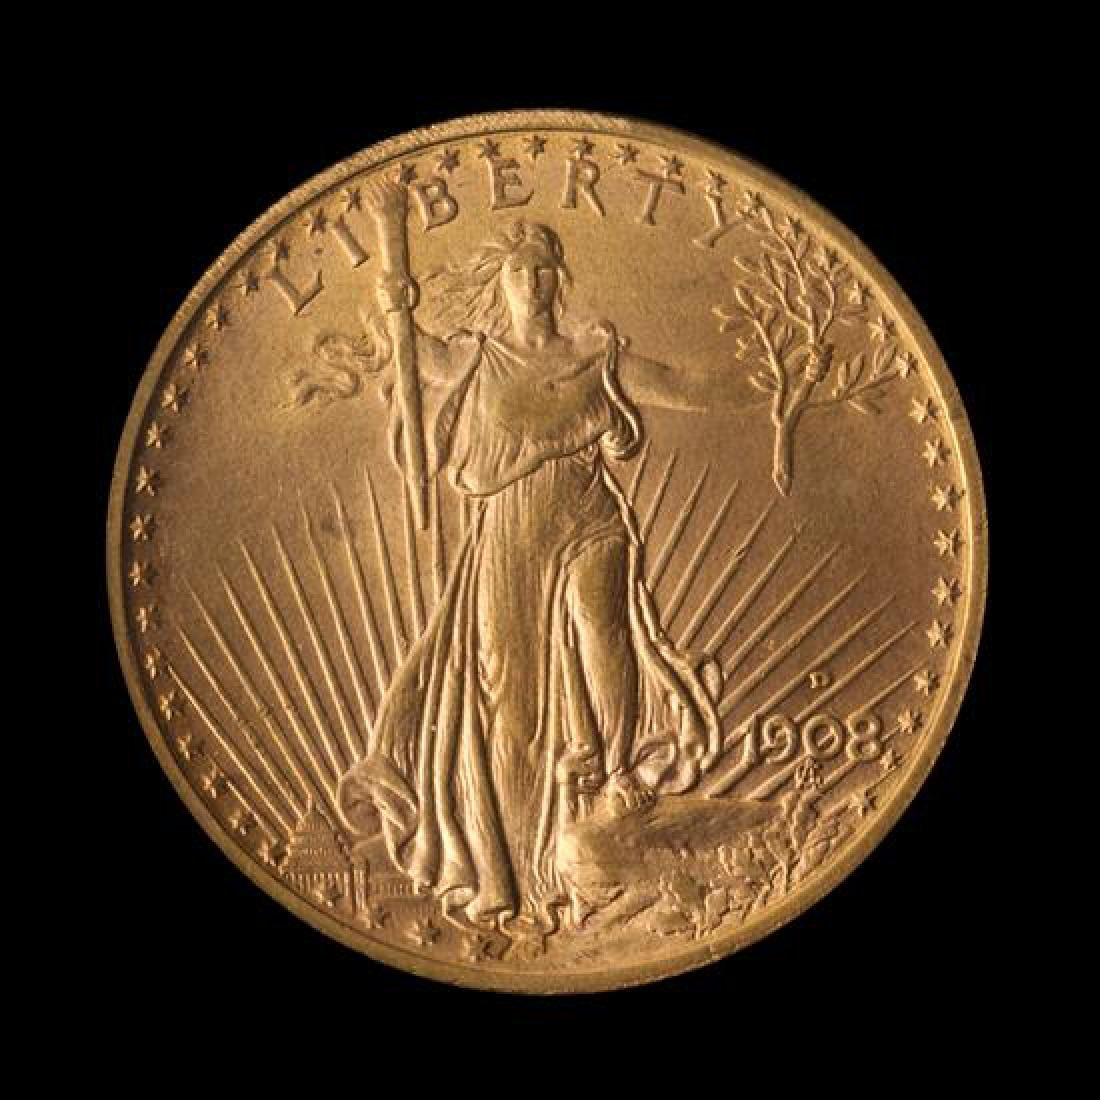 A United States 1908-D Saint-Gaudens: Motto $20 Gold